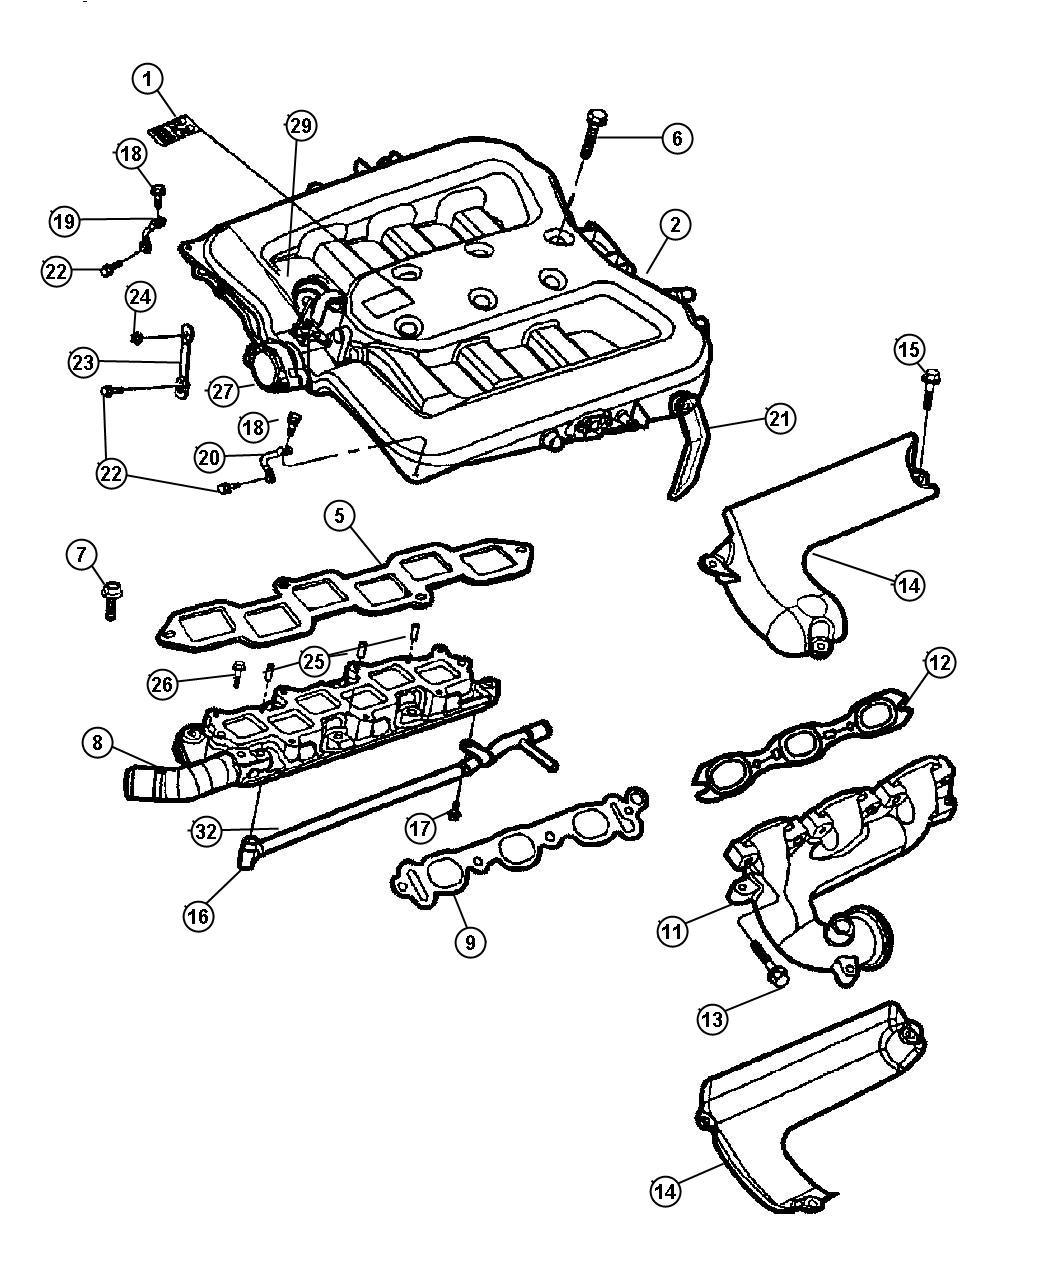 Dodge Intrepid Shield Lower Left Exhaust Manifold Engine Number Ab Lower Left